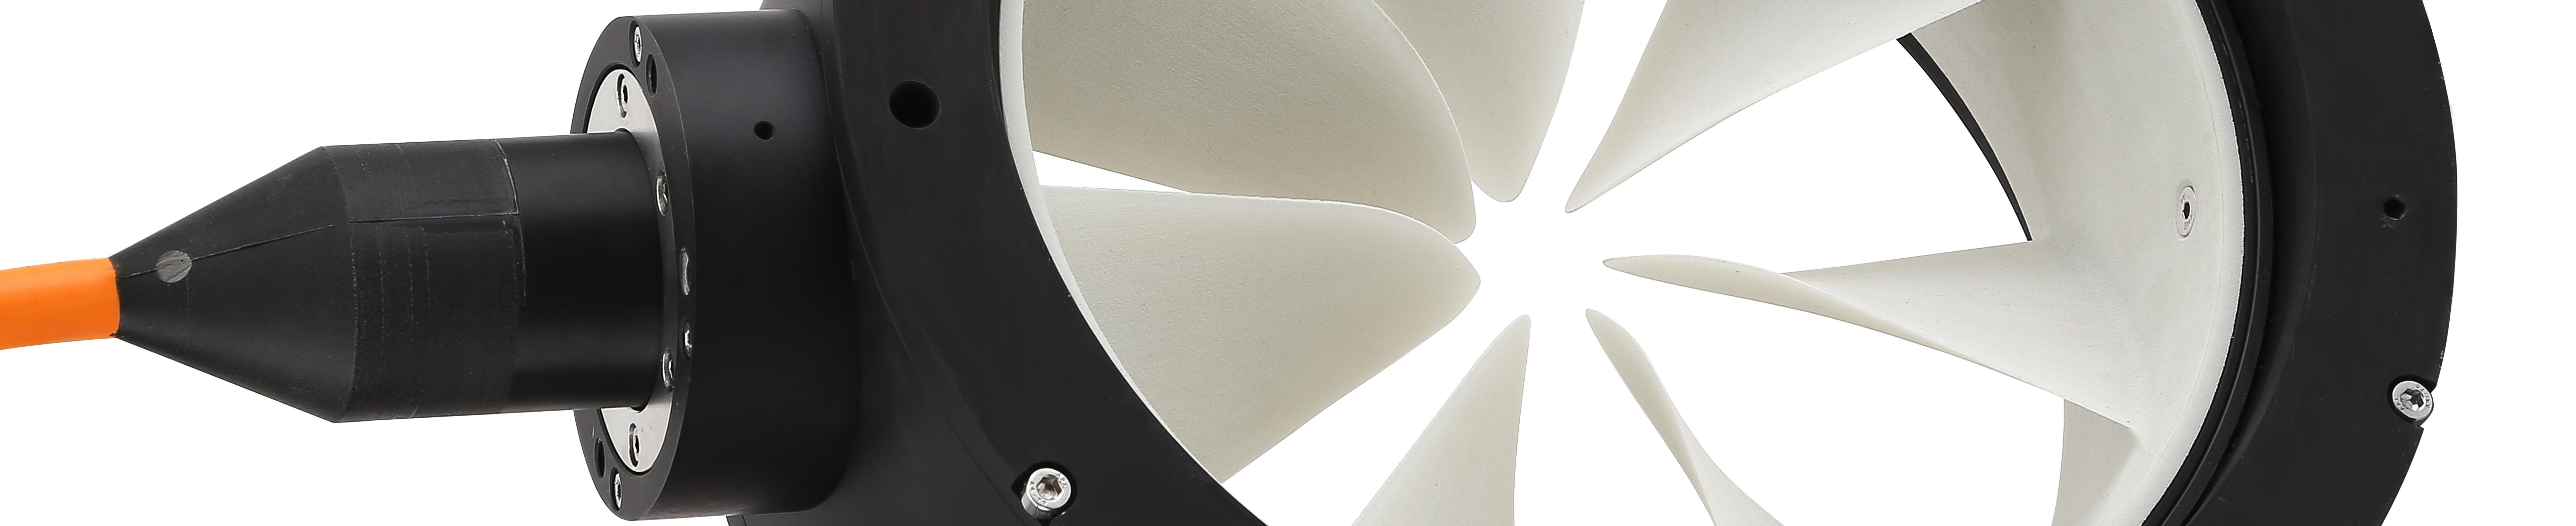 Symmetric propeller